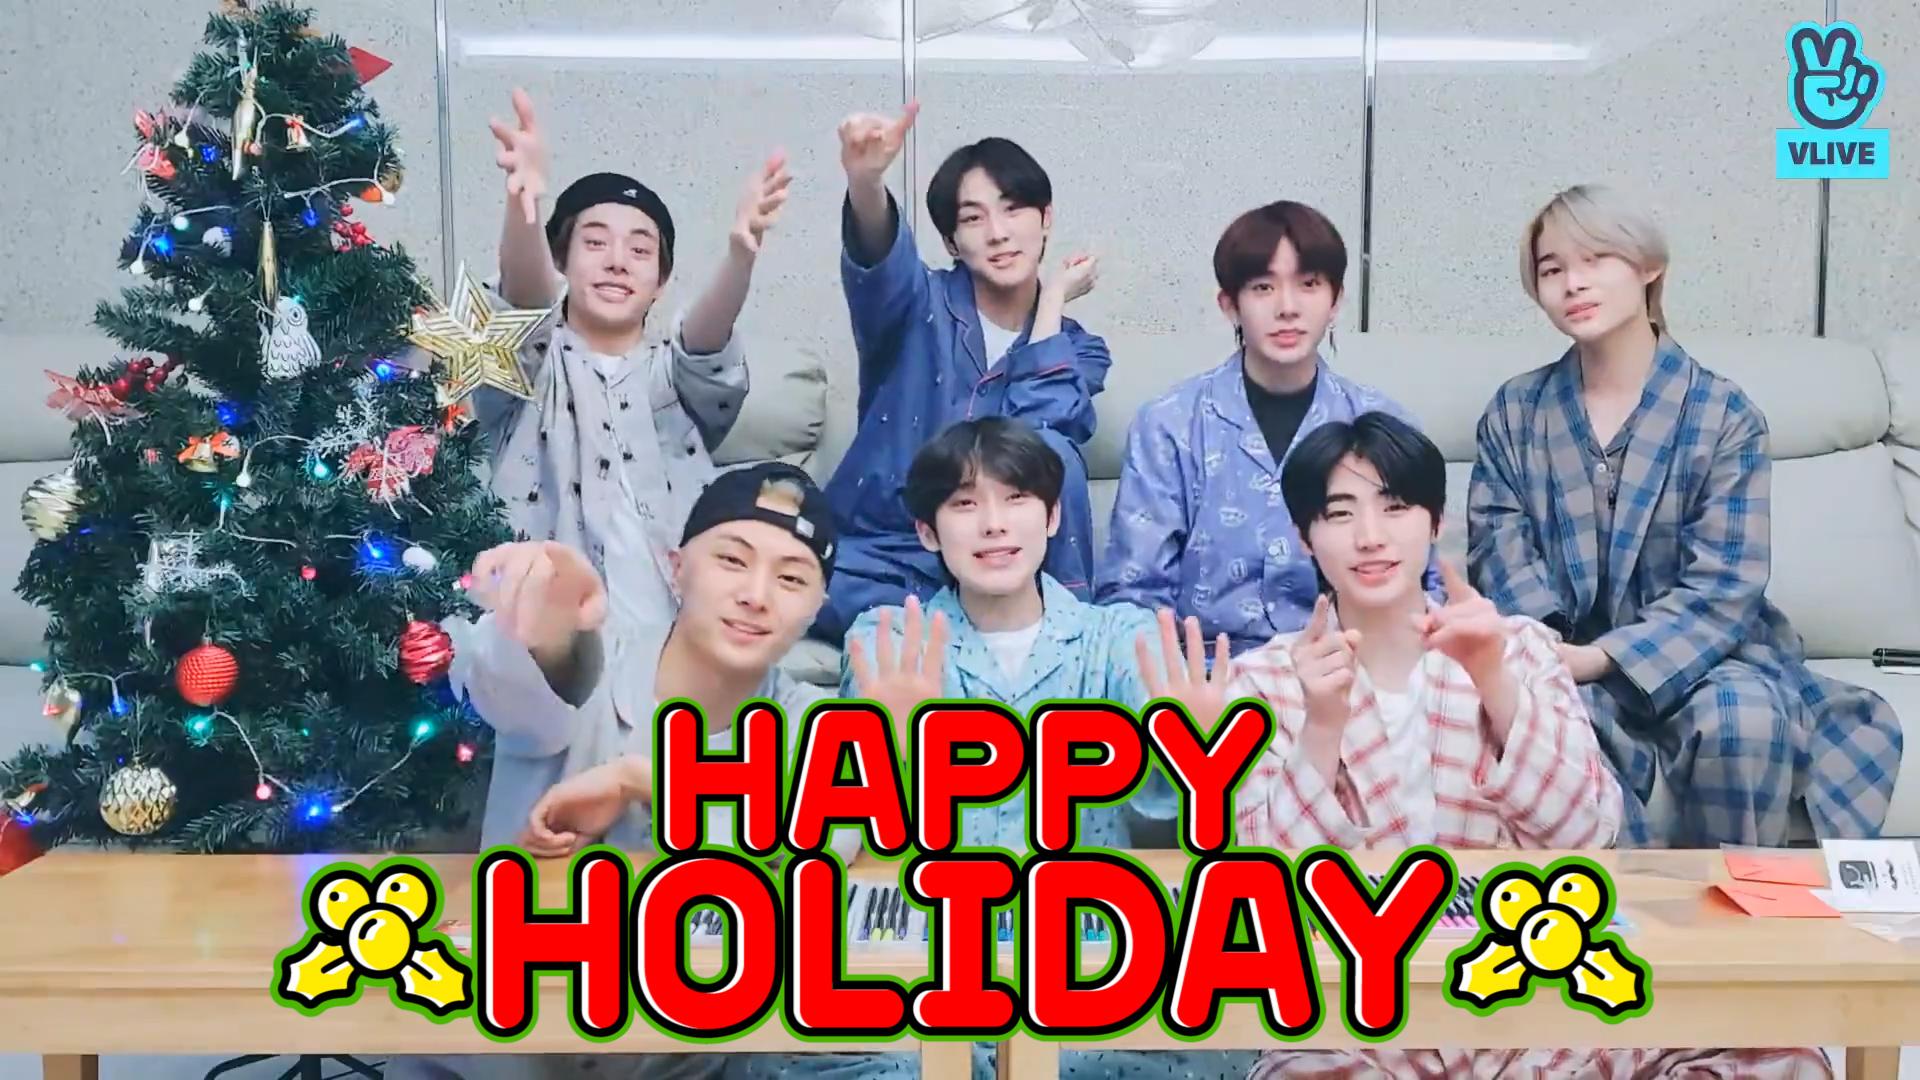 [ENHYPEN] 이픈이들 크리스마스 썰에 마음이 따뜻해진다..☺️🎄 (ENHYPEN's special memories of Christmas)